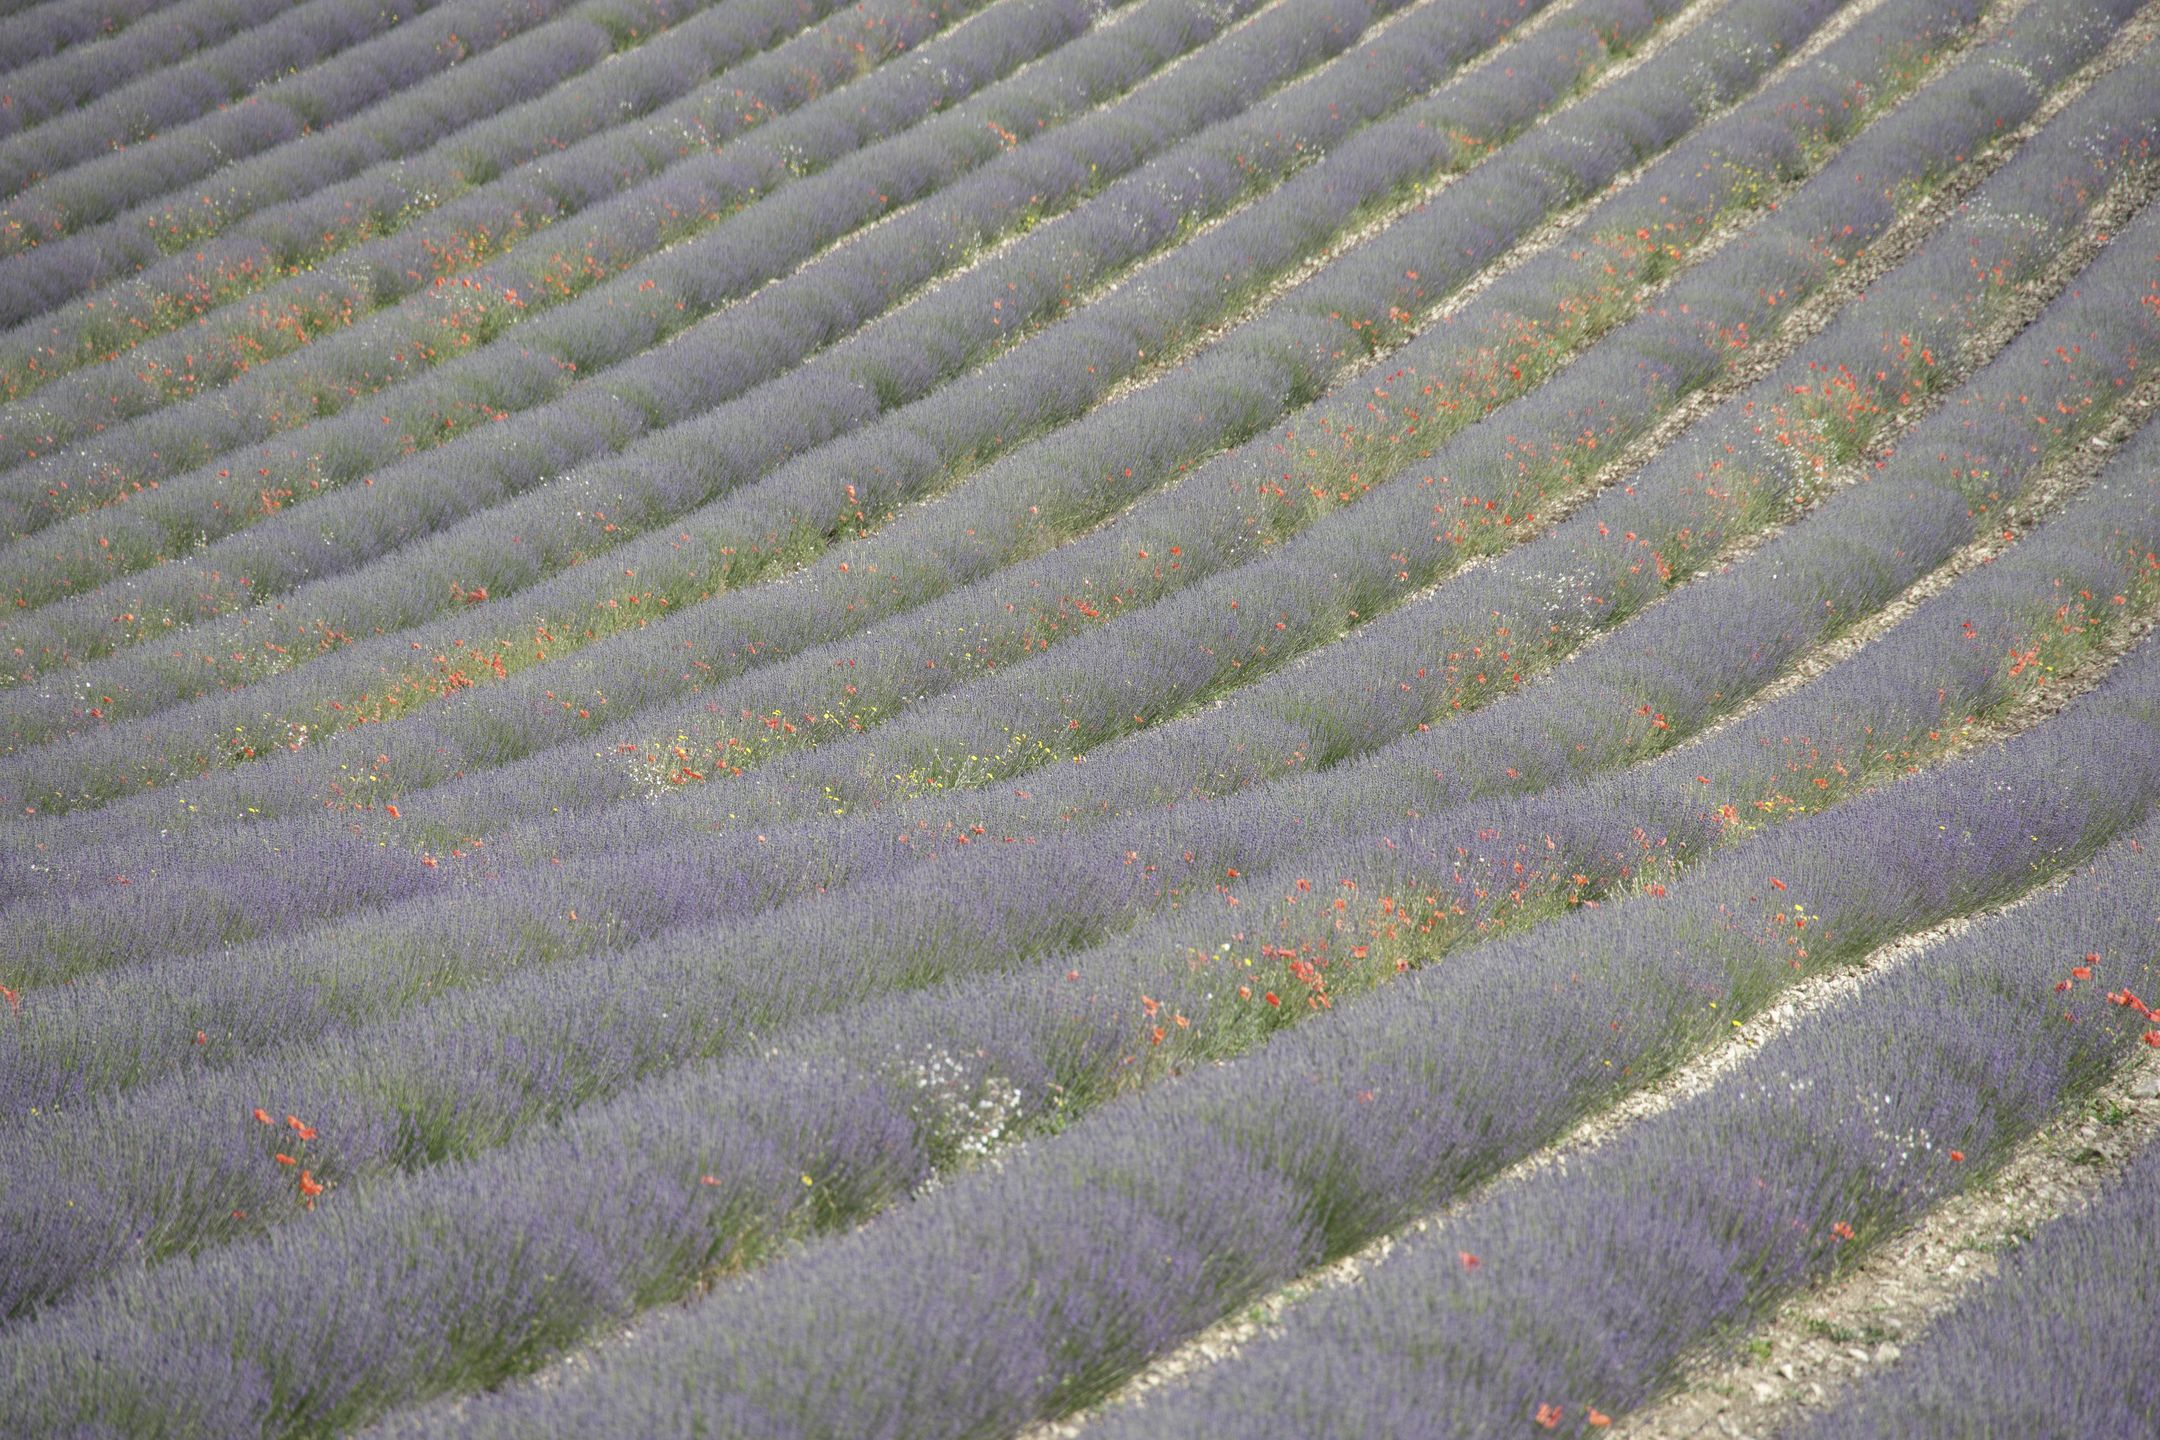 20210628-Provence-08-58-21-008